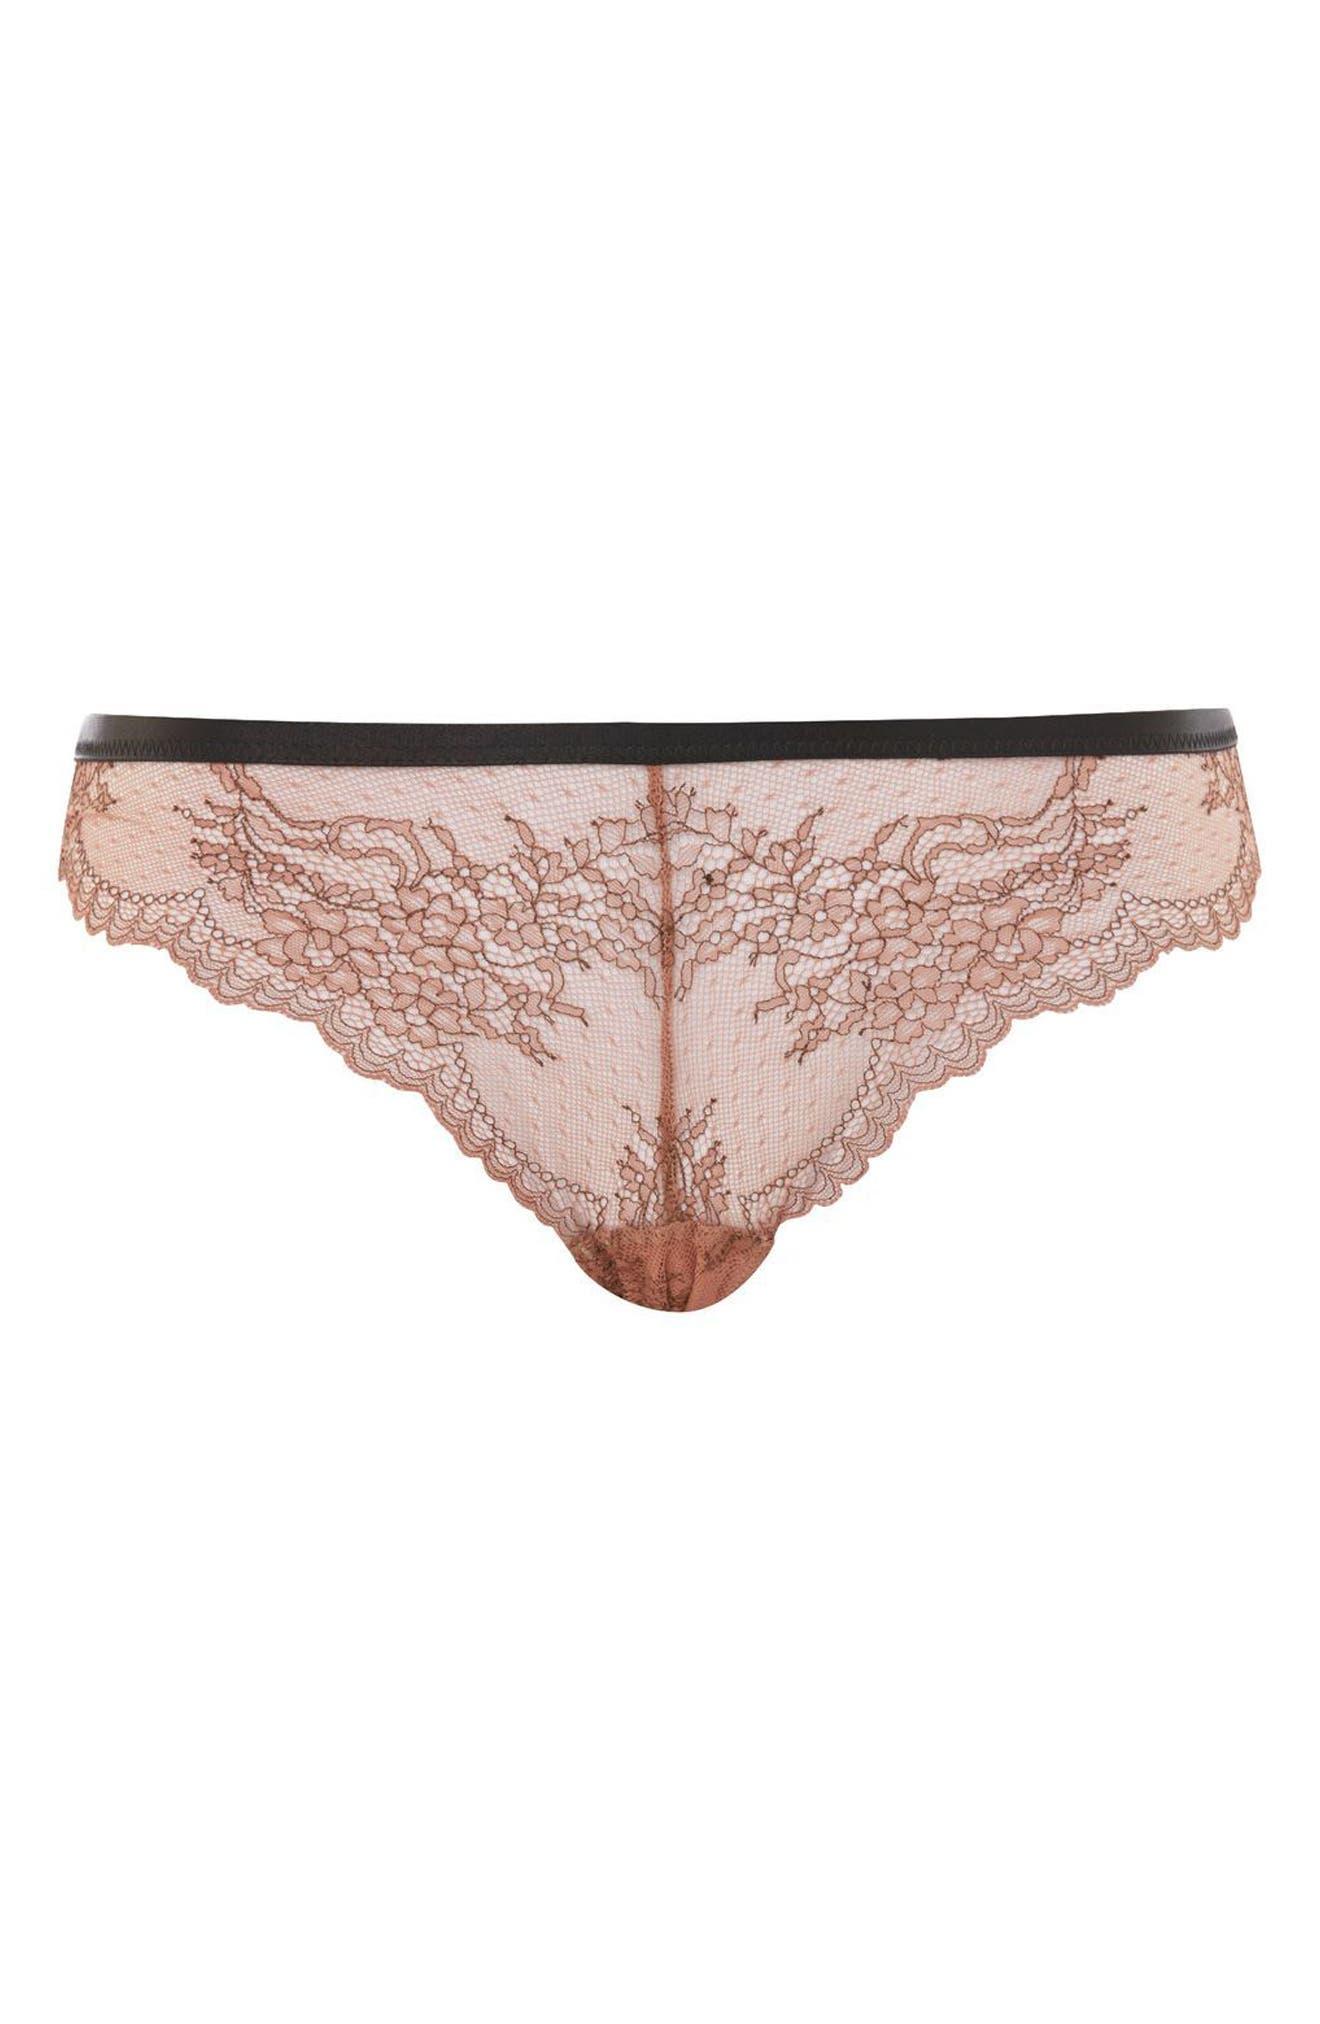 Main Image - Topshop Lila Lace Brazilian Panties